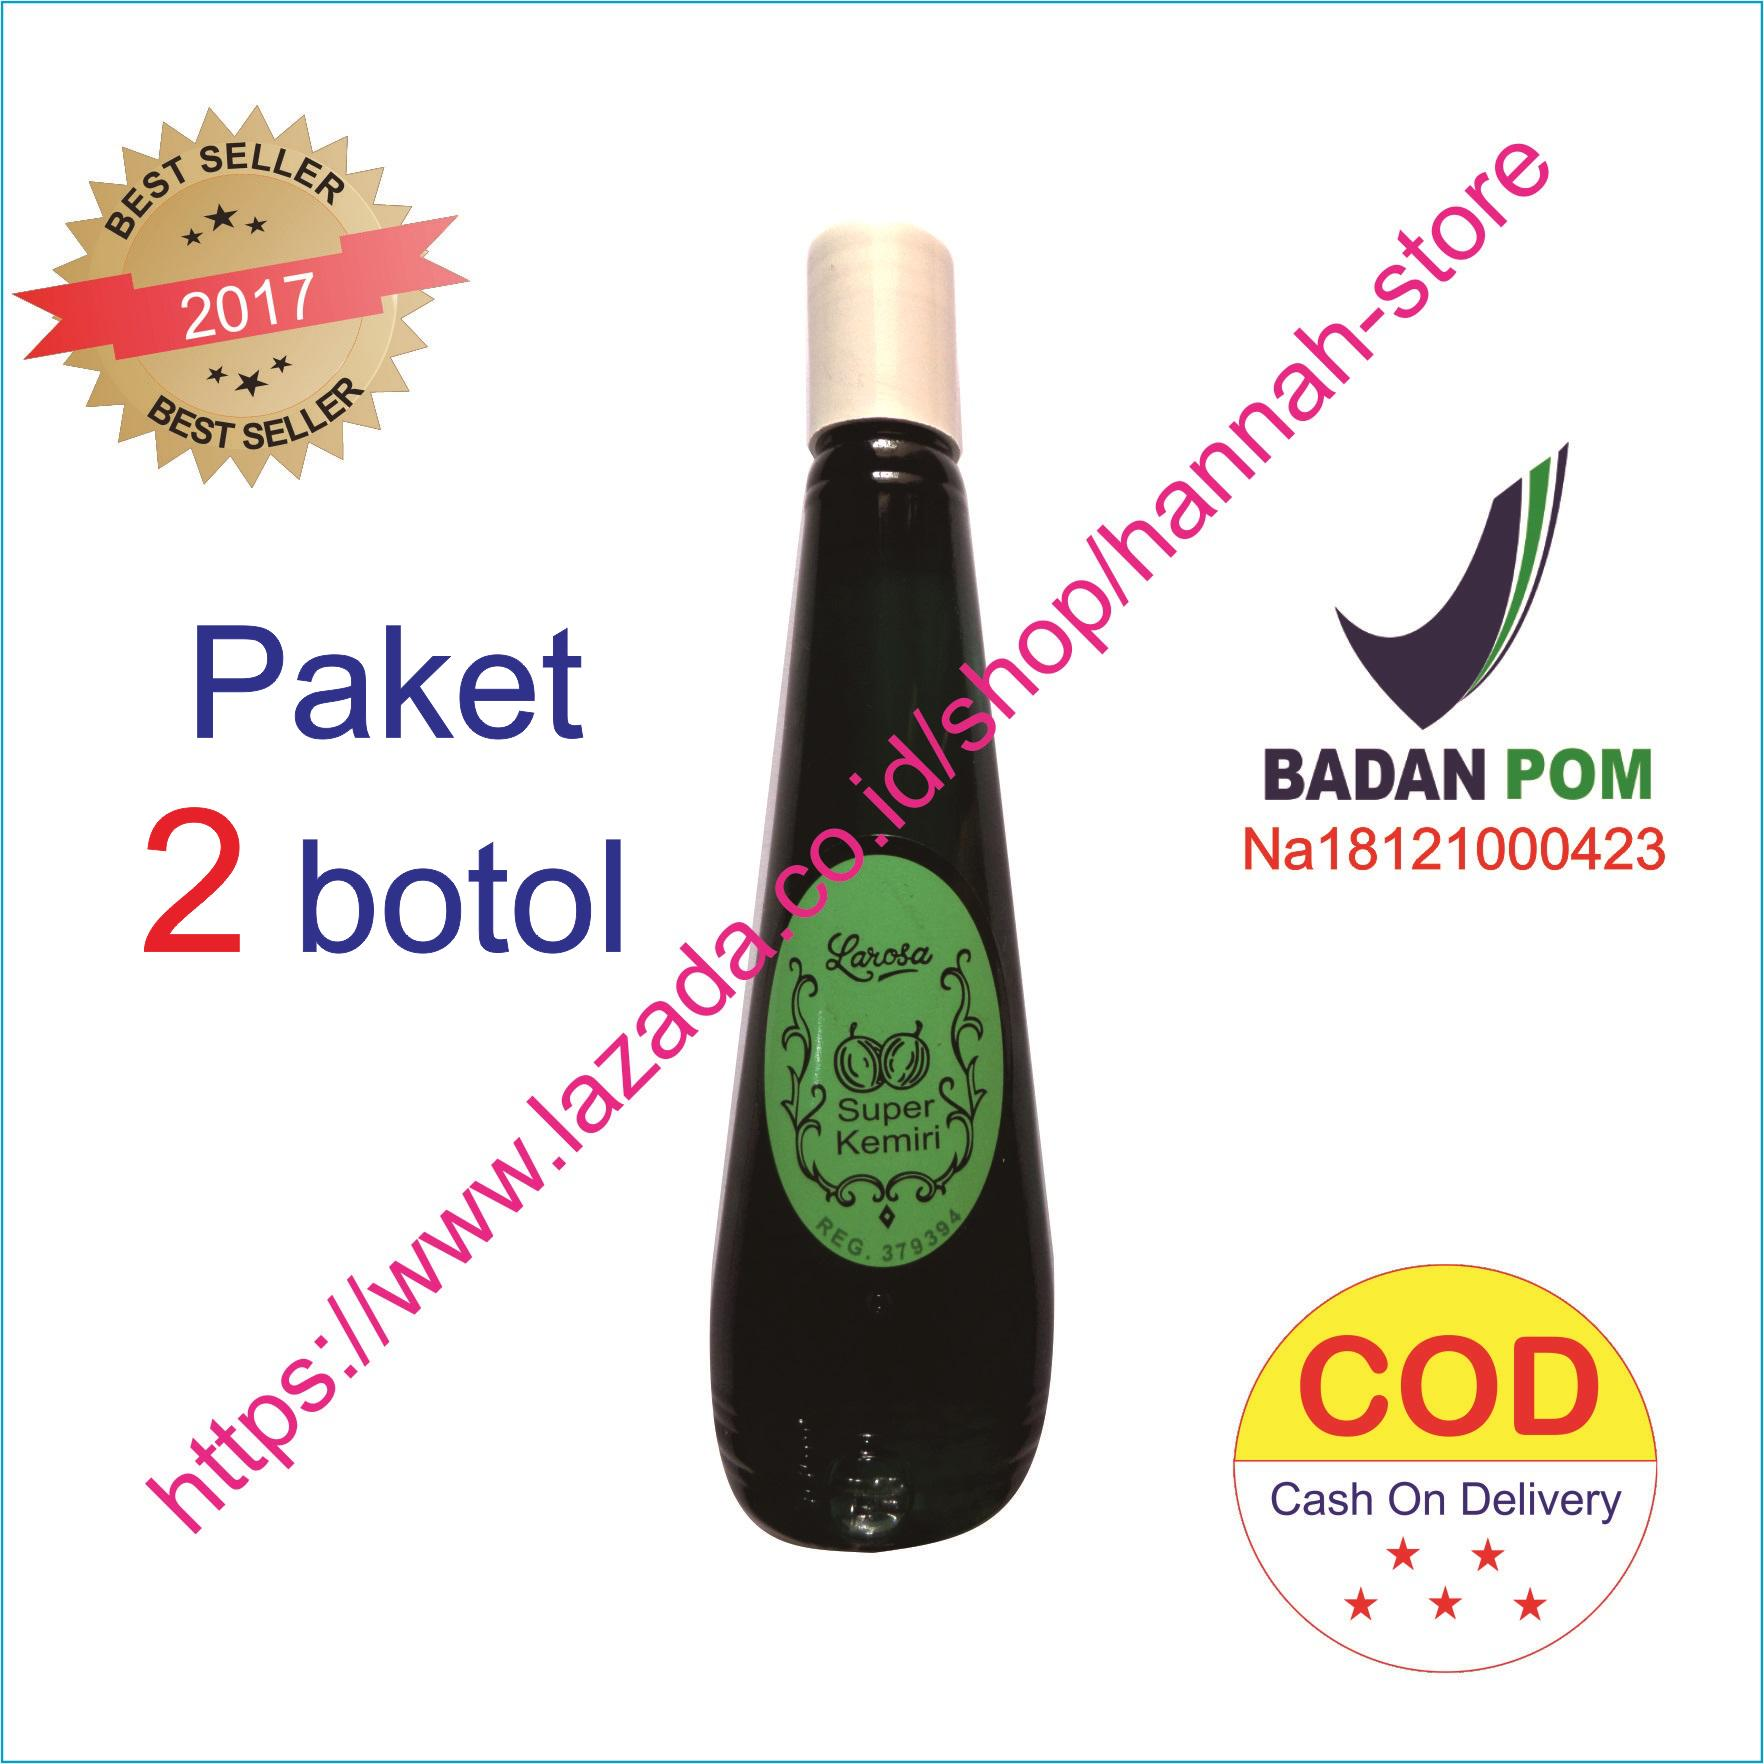 jual produk minyak kemiri terbaru di lazada.co.id Tempat Jual Minyak Kemiri Di Malang